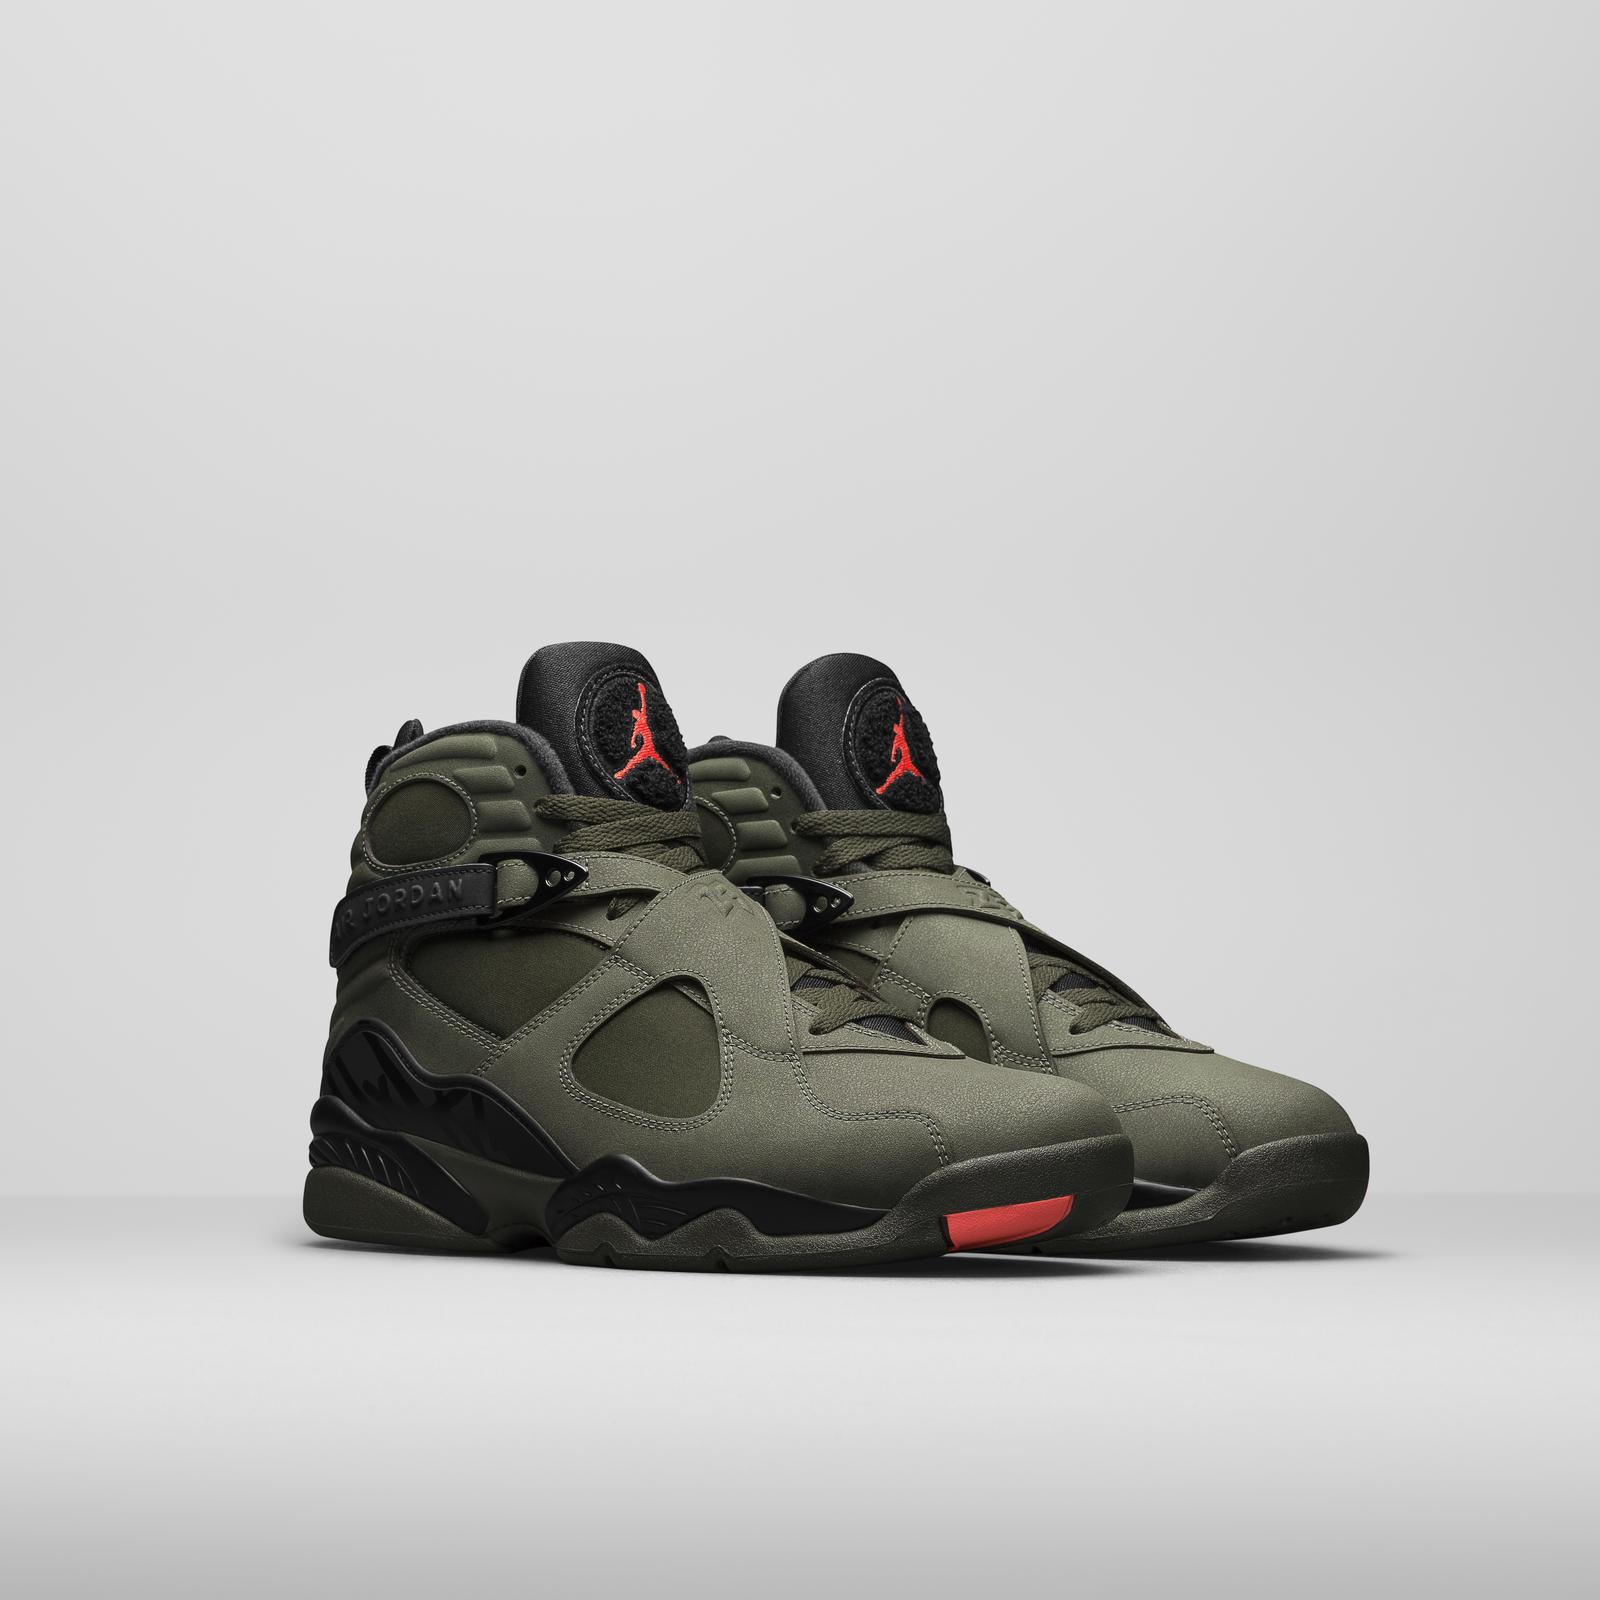 7854bf5e9a16dc Jordan Brand Unveils Select Spring 17 Air Jordan Silhouettes - Nike News